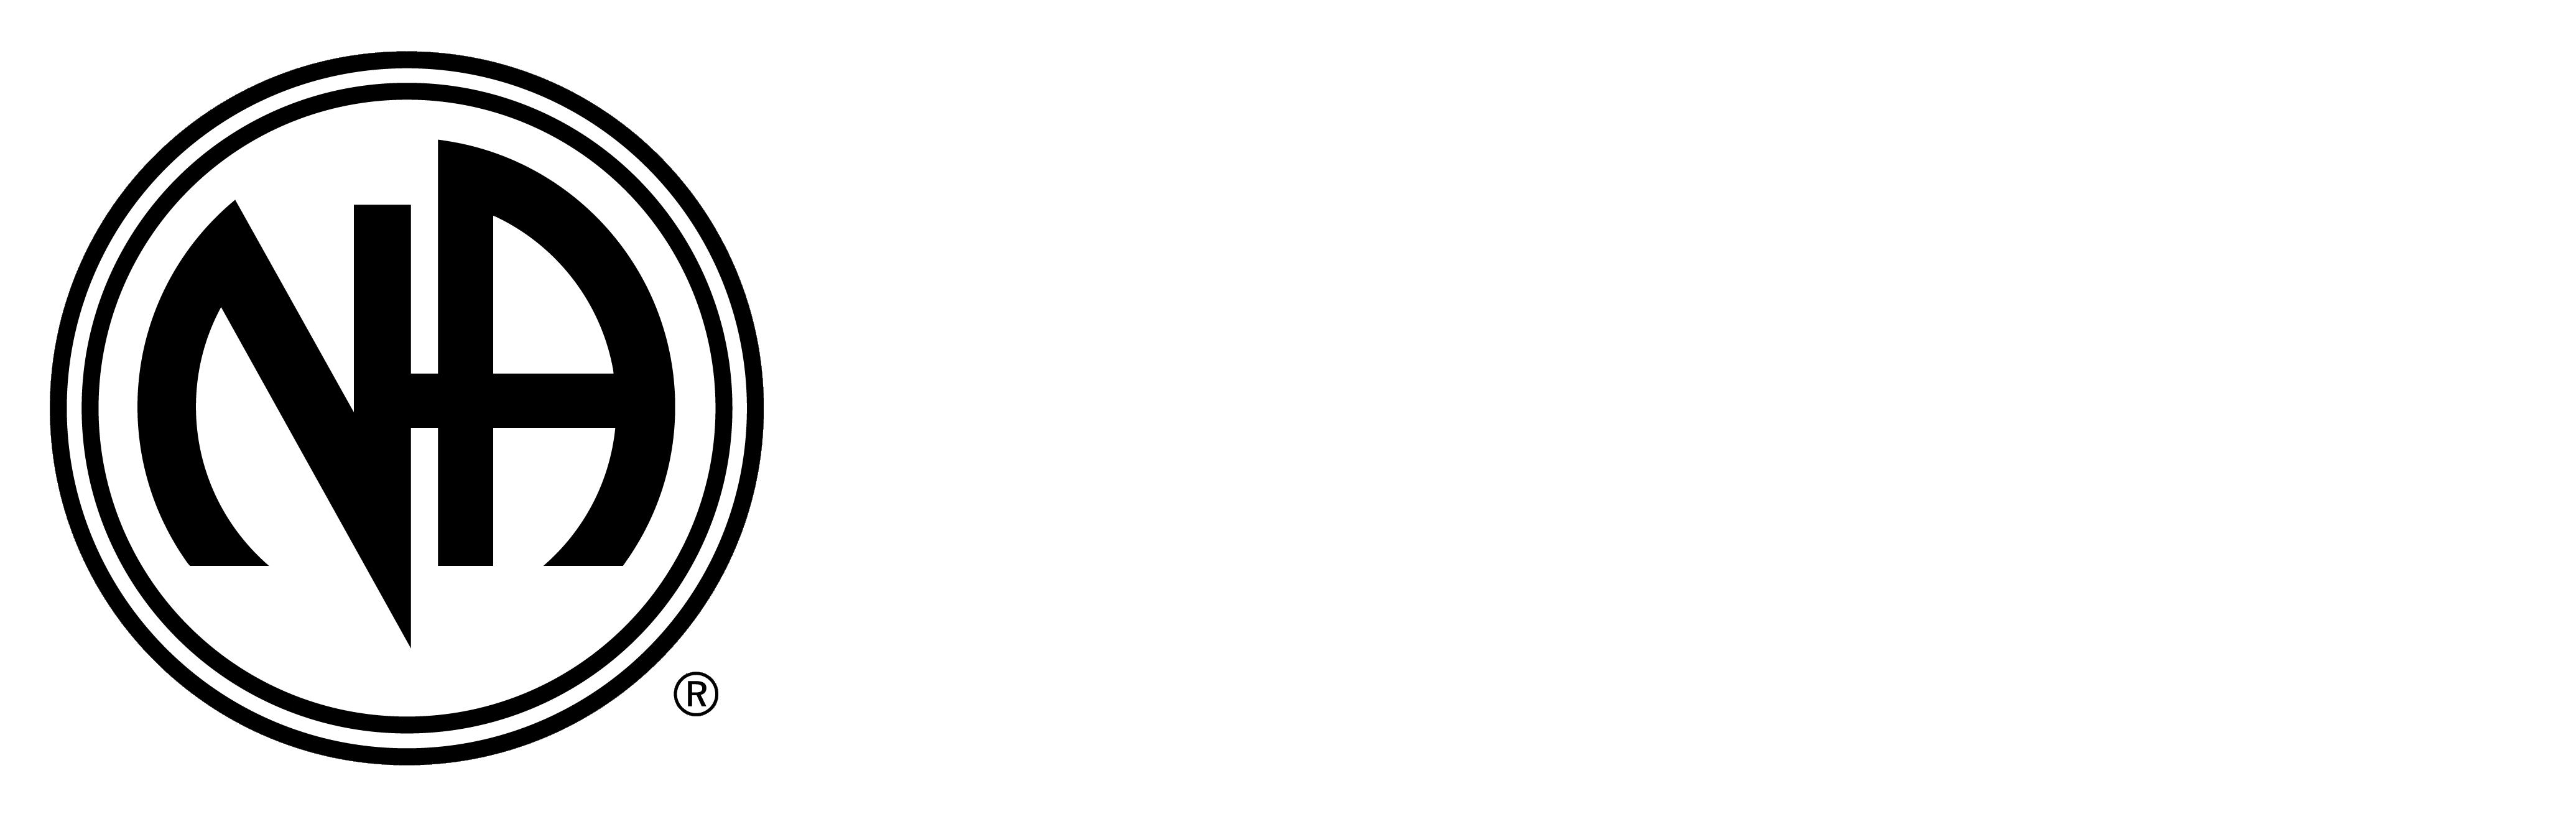 Gebiet Berlin